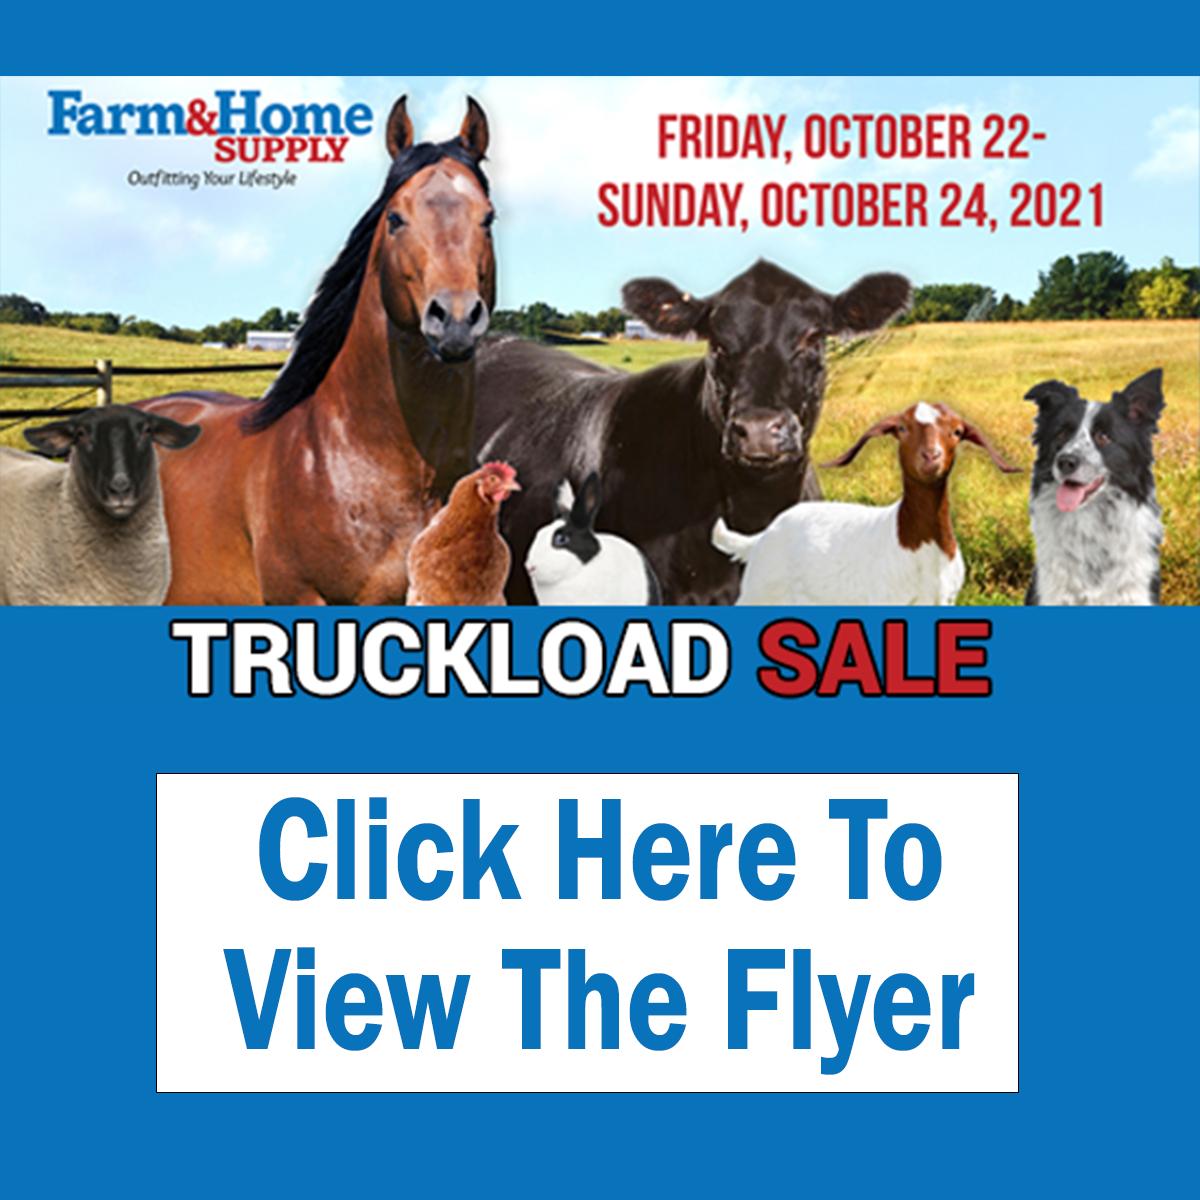 Truckload Feed Sale